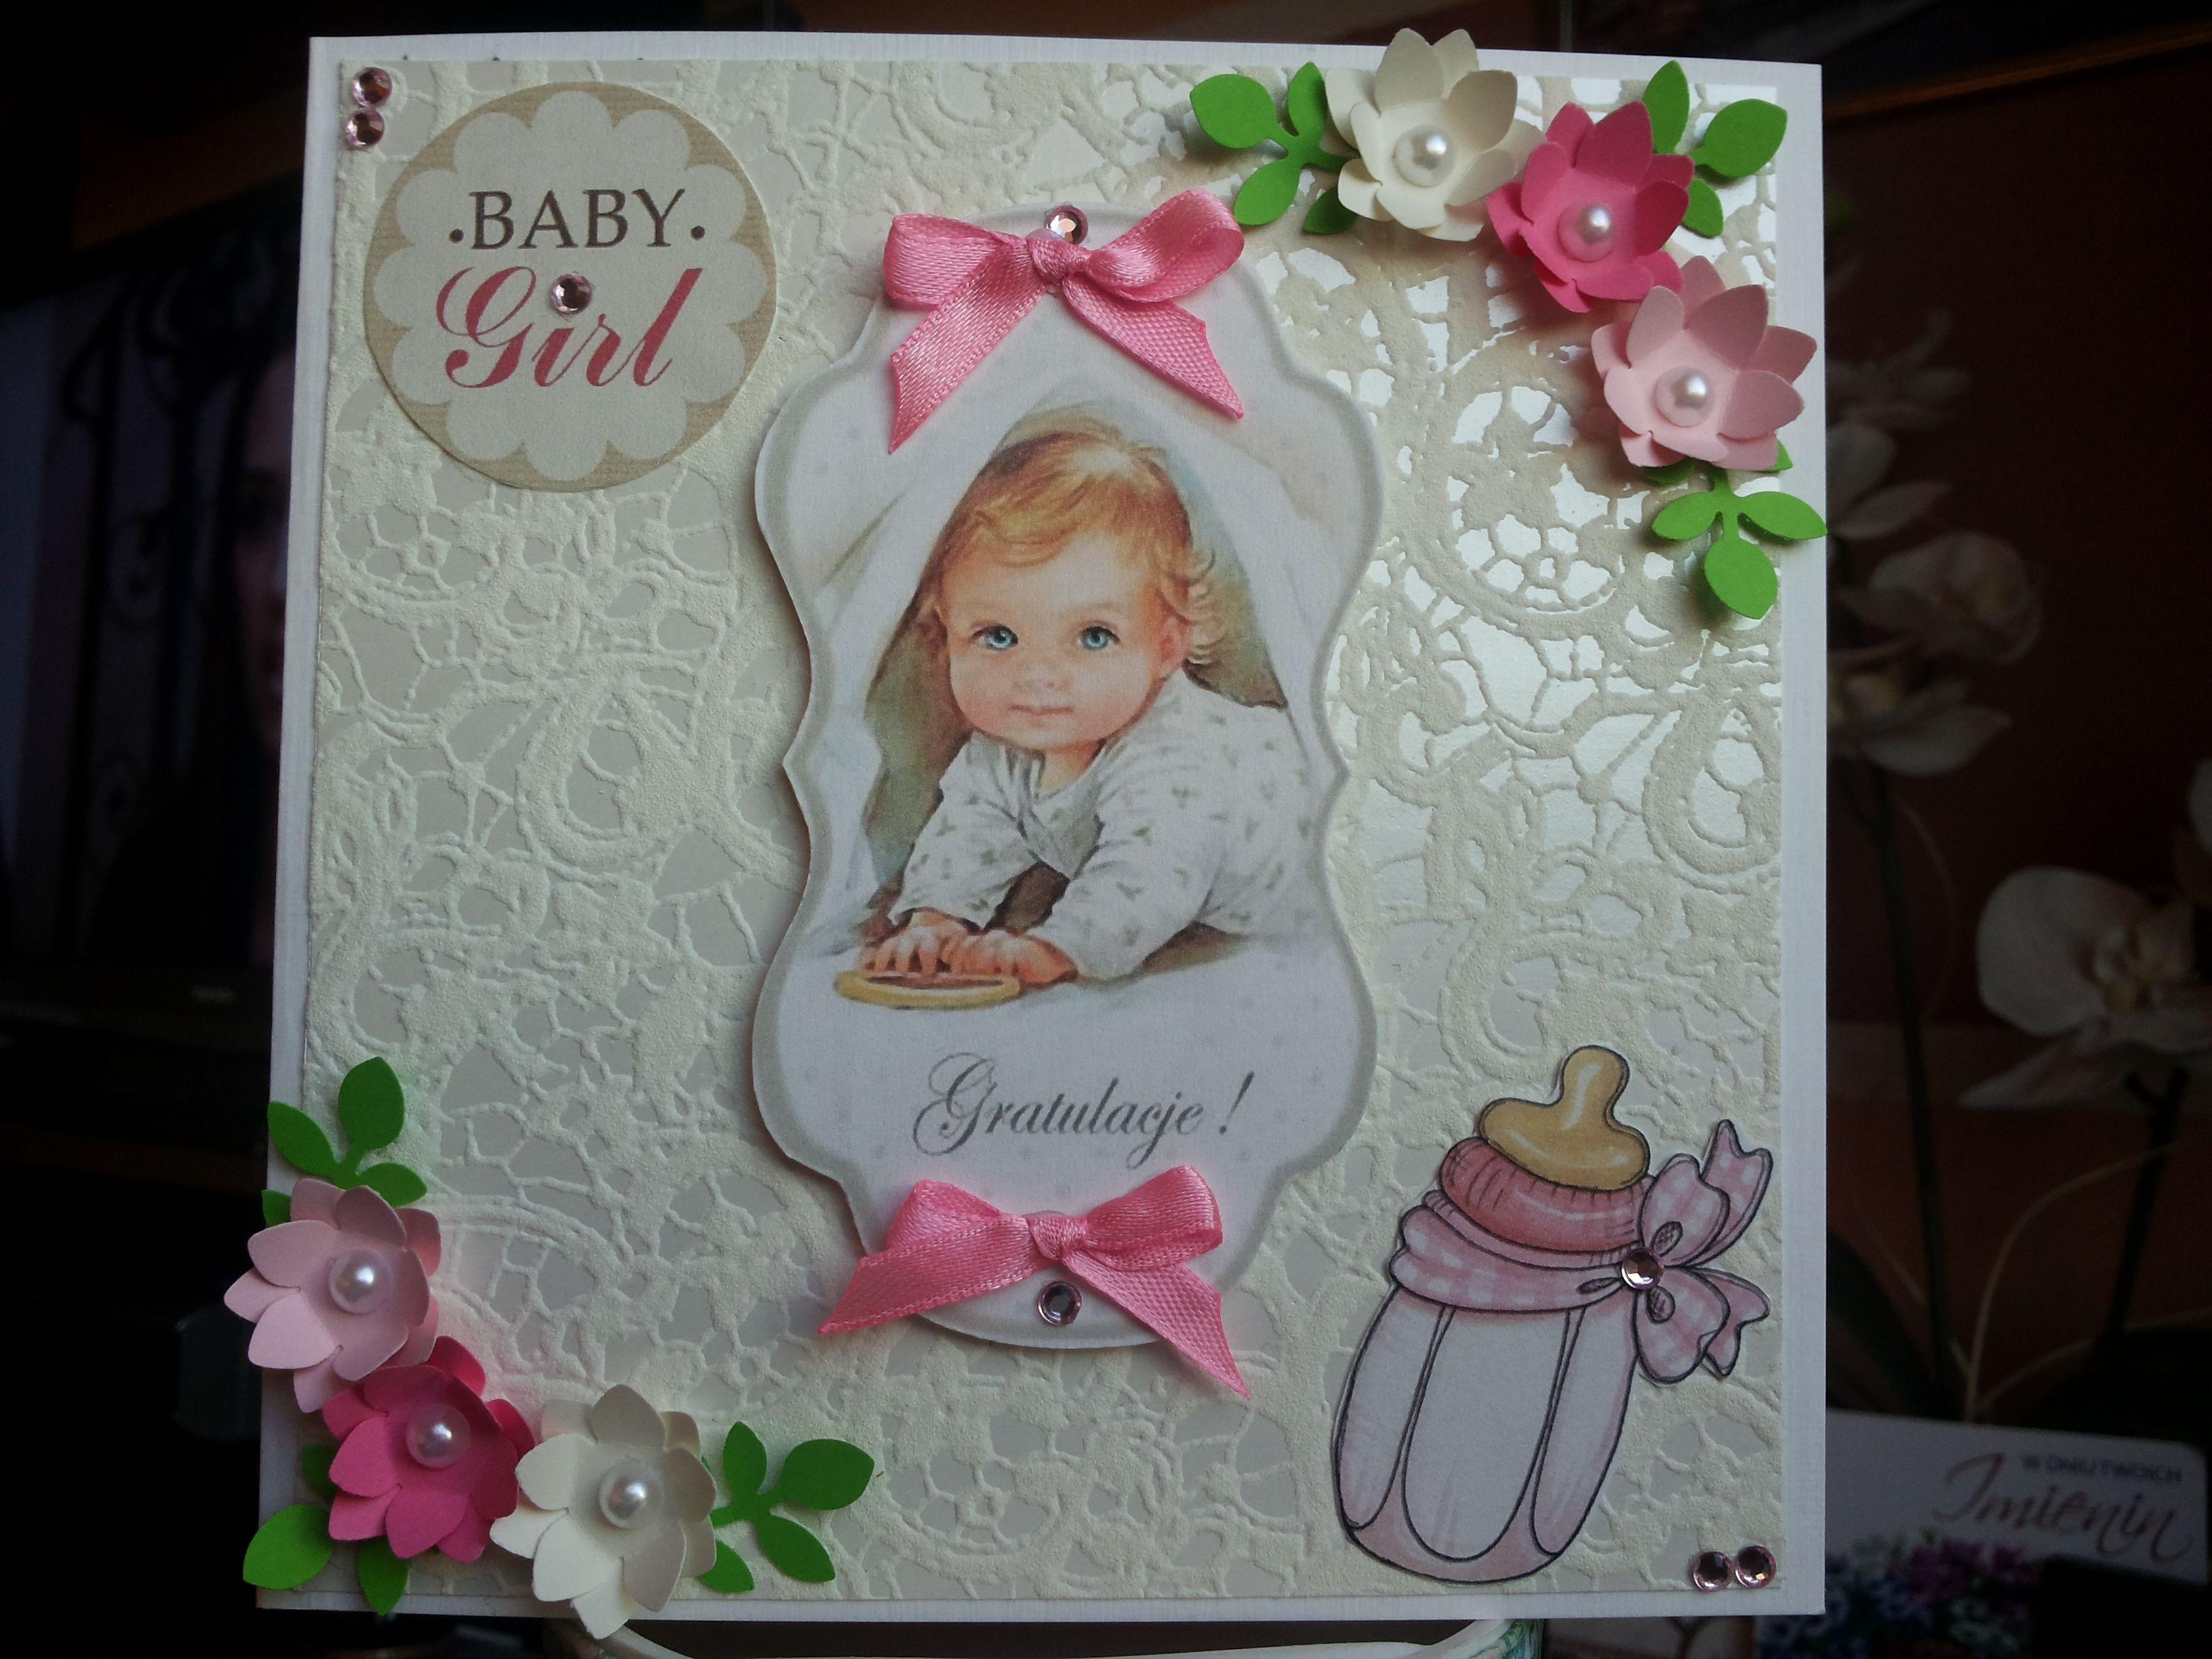 Gratulacje Z Narodzin Dziecka Congratulations On The Birth Of A